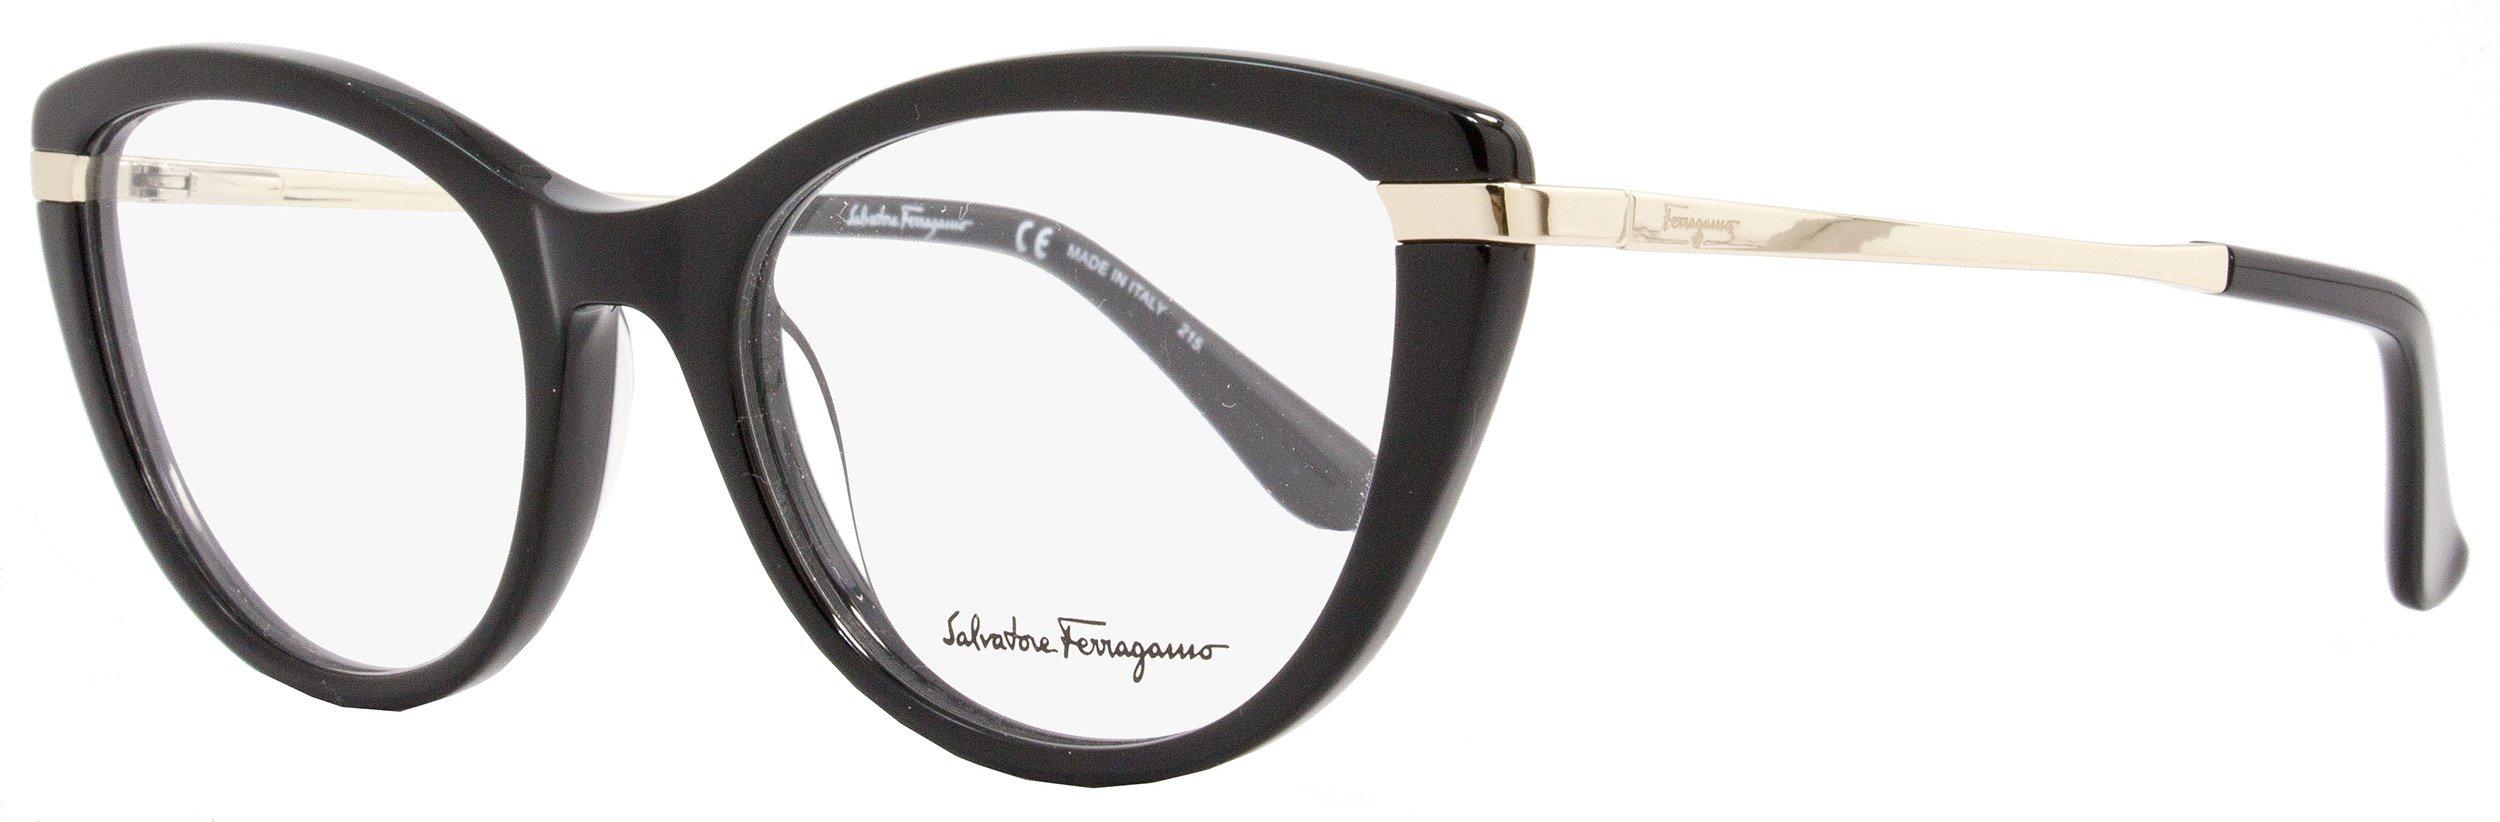 SALVATORE FERRAGAMO Eyeglasses SF2731 001 Black 52MM by Salvatore Ferragamo